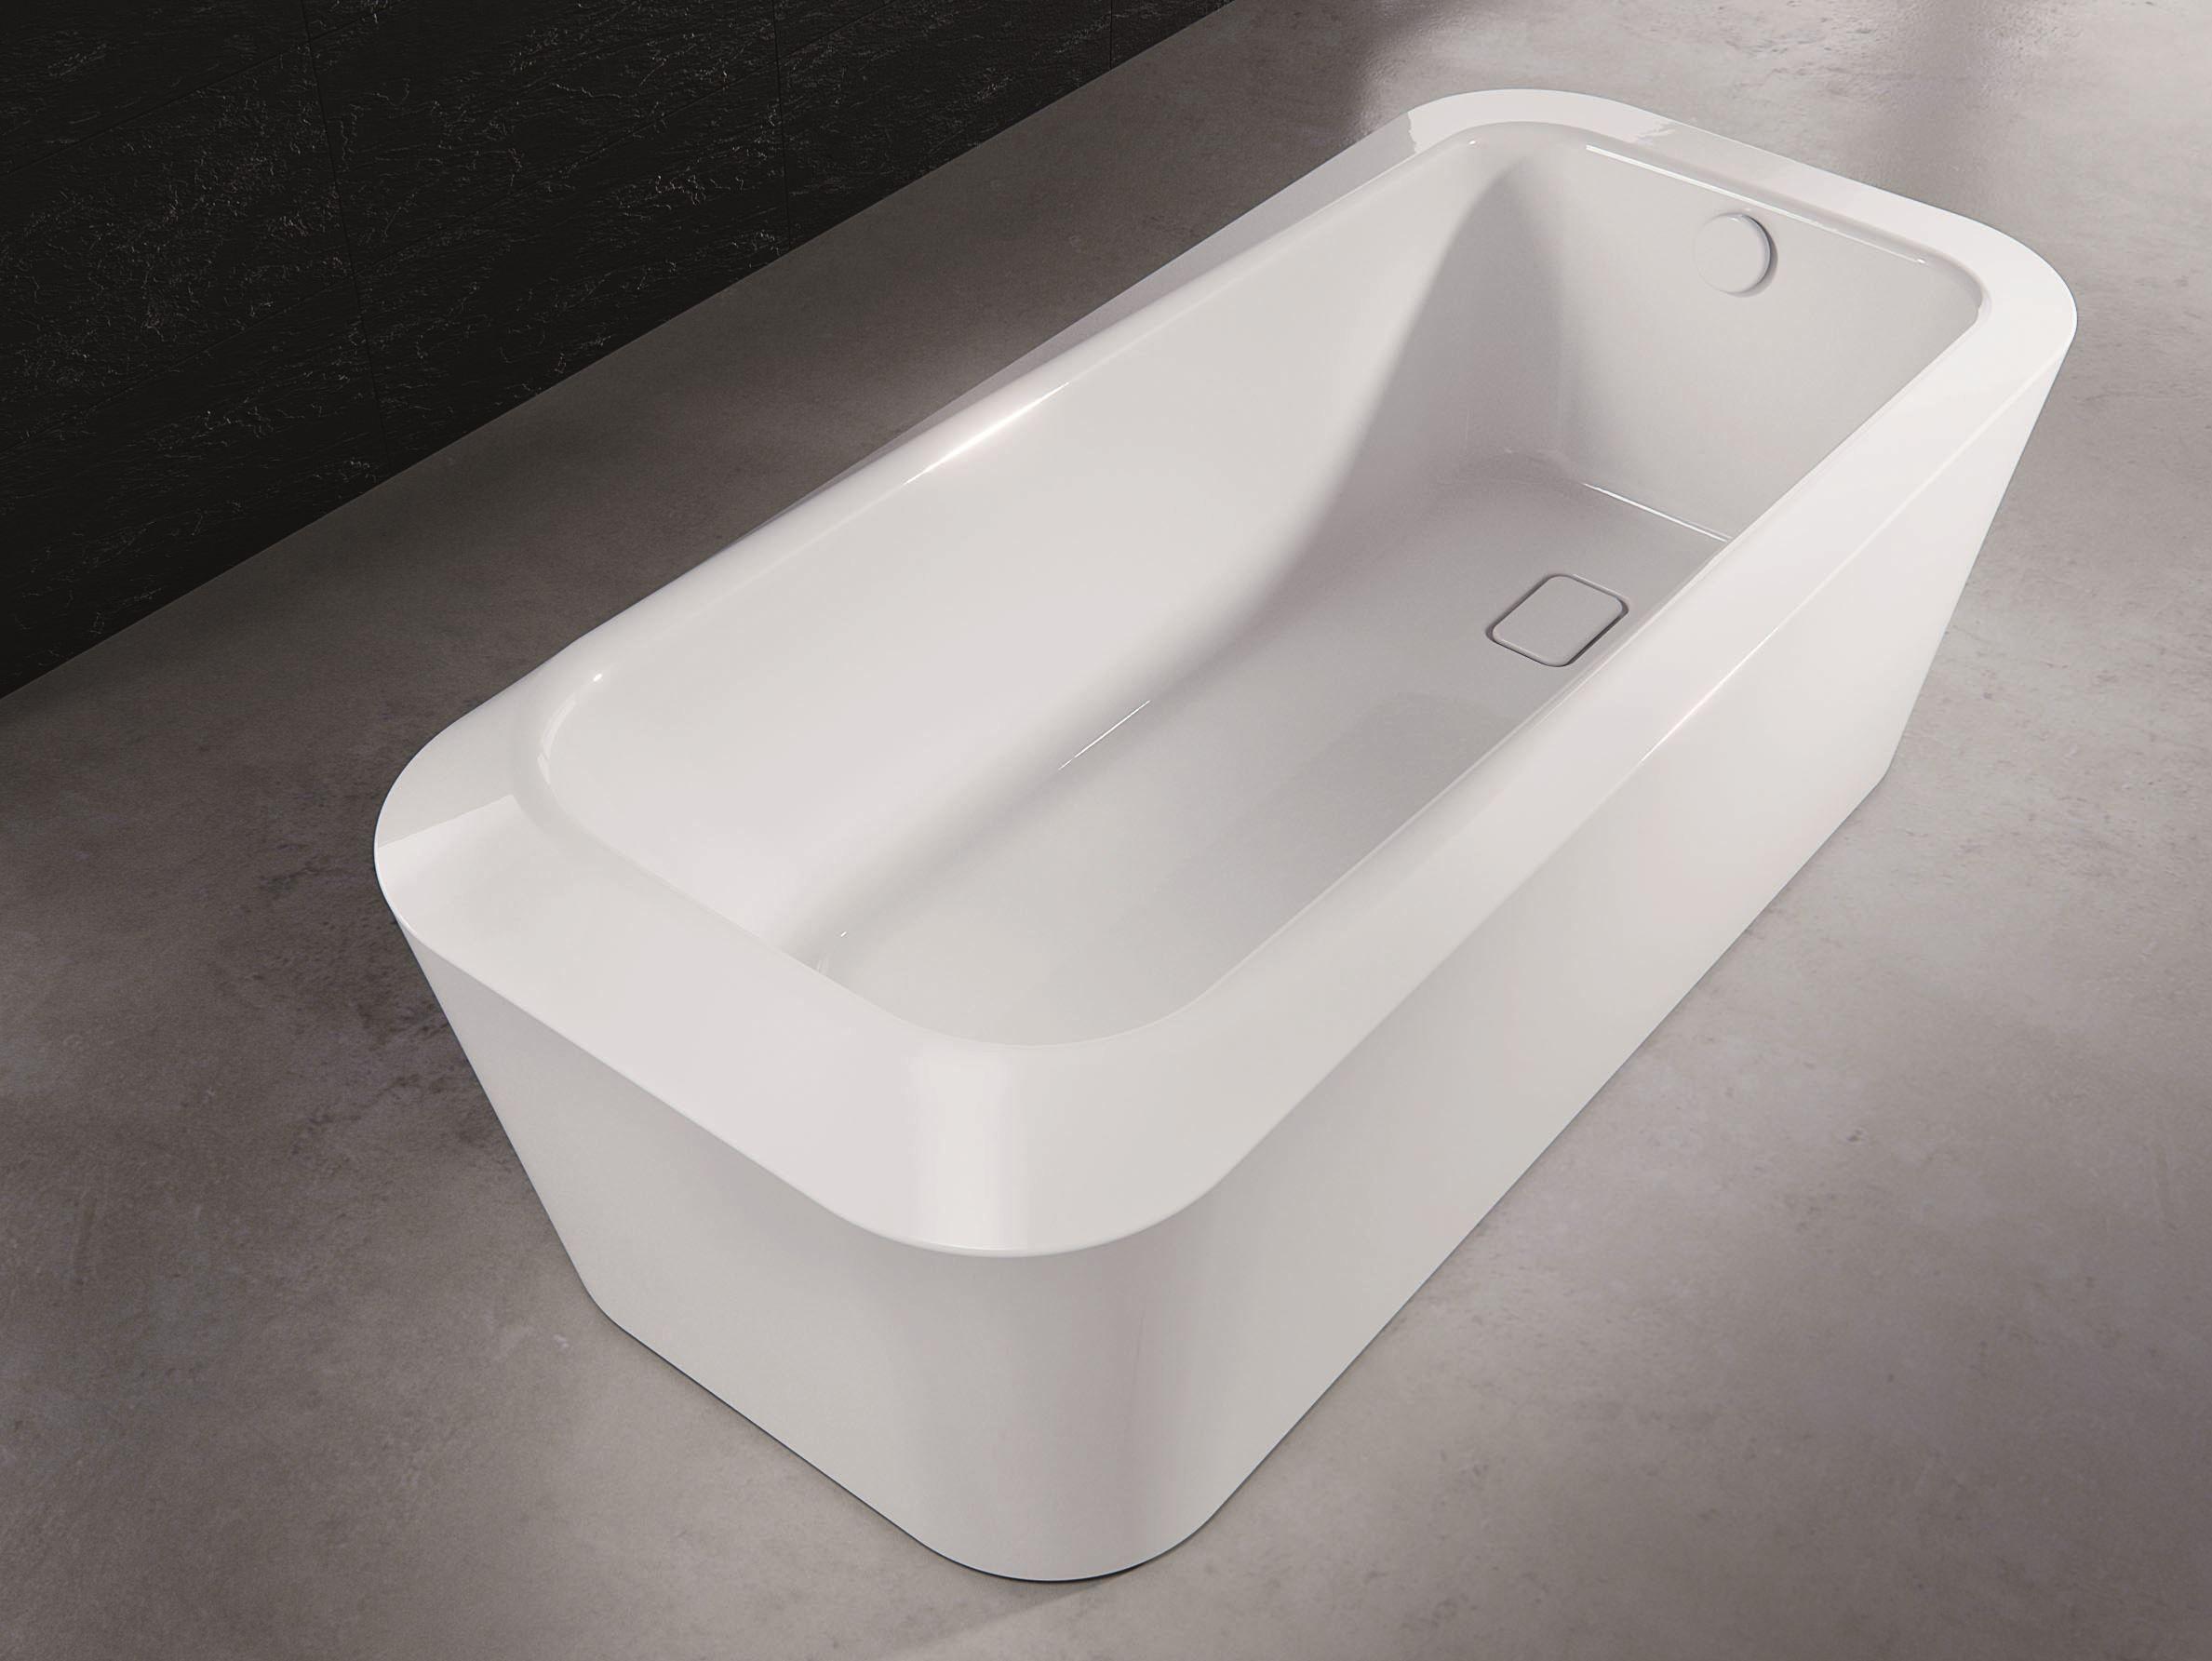 Meisterst ck emerso baignoire by kaldewei italia design arik levy - Baignoire acier emaille ...